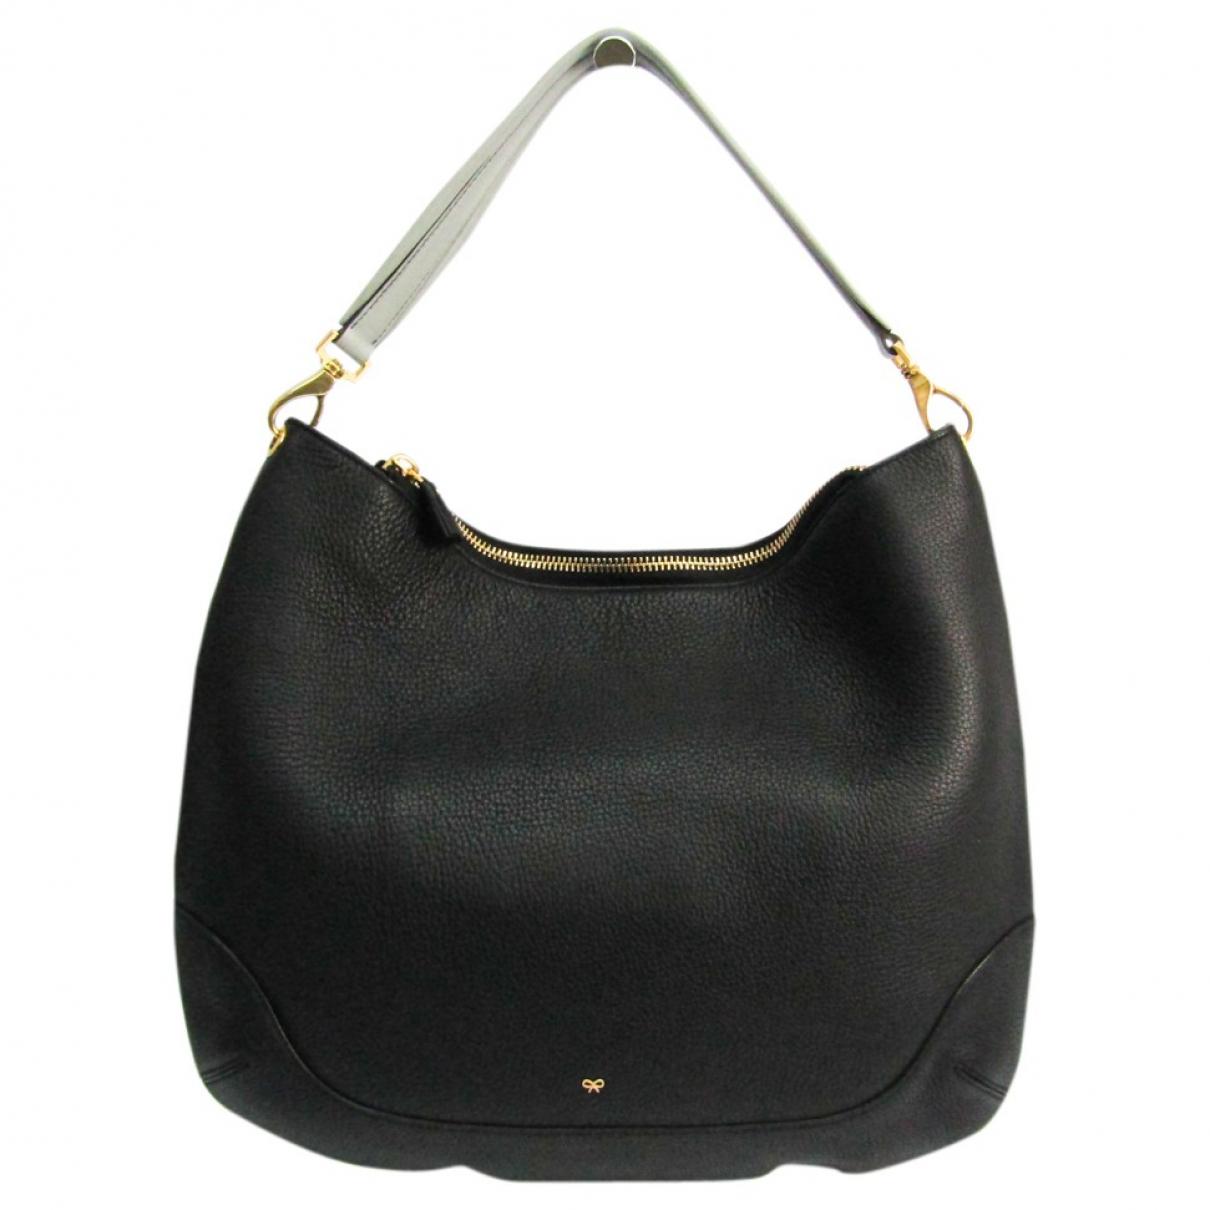 Anya Hindmarch N Black Leather handbag for Women N